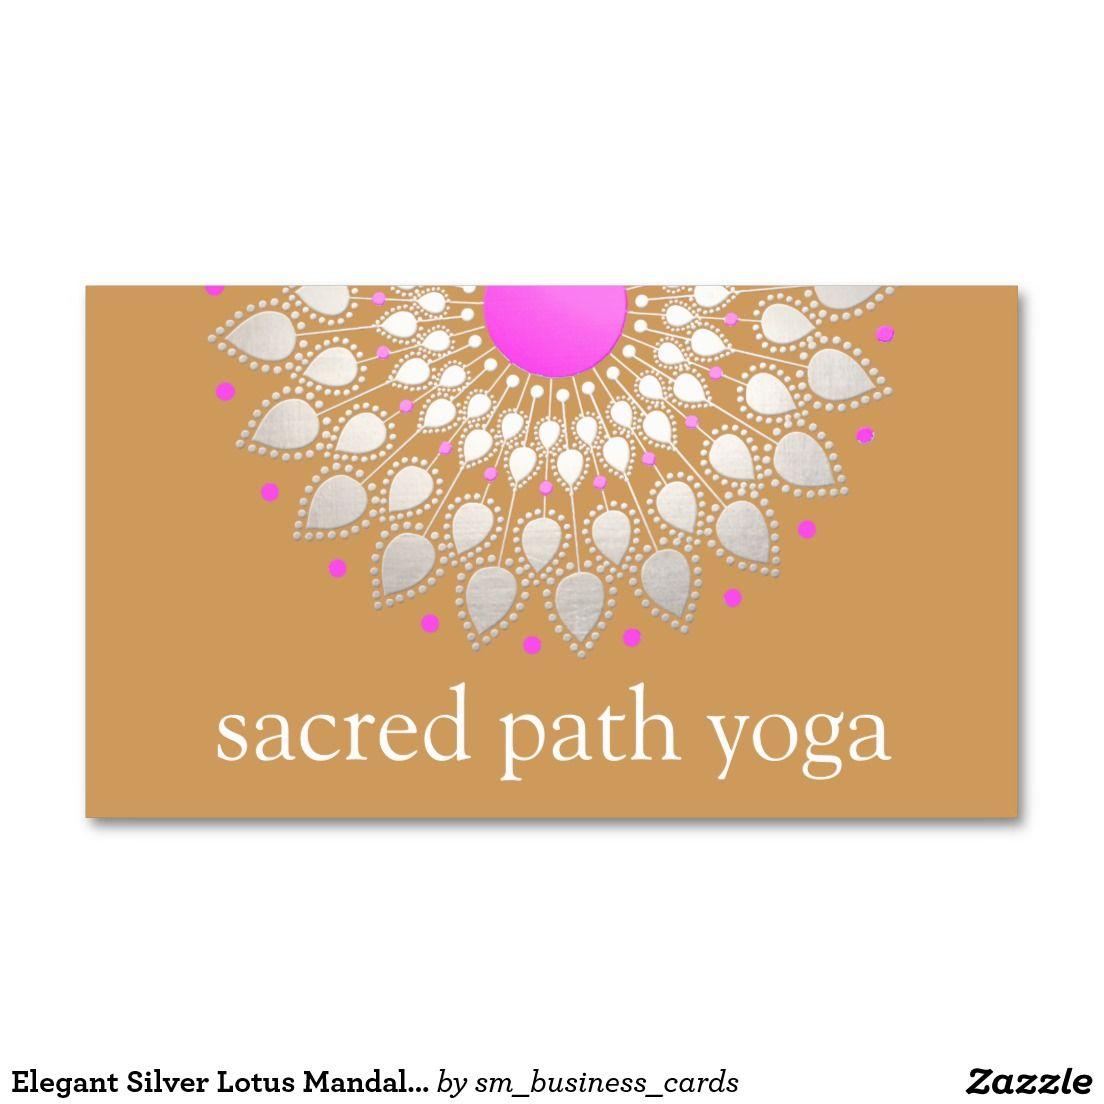 Elegant Silver Lotus Mandala Yoga Instructor Business Card -perfect ...